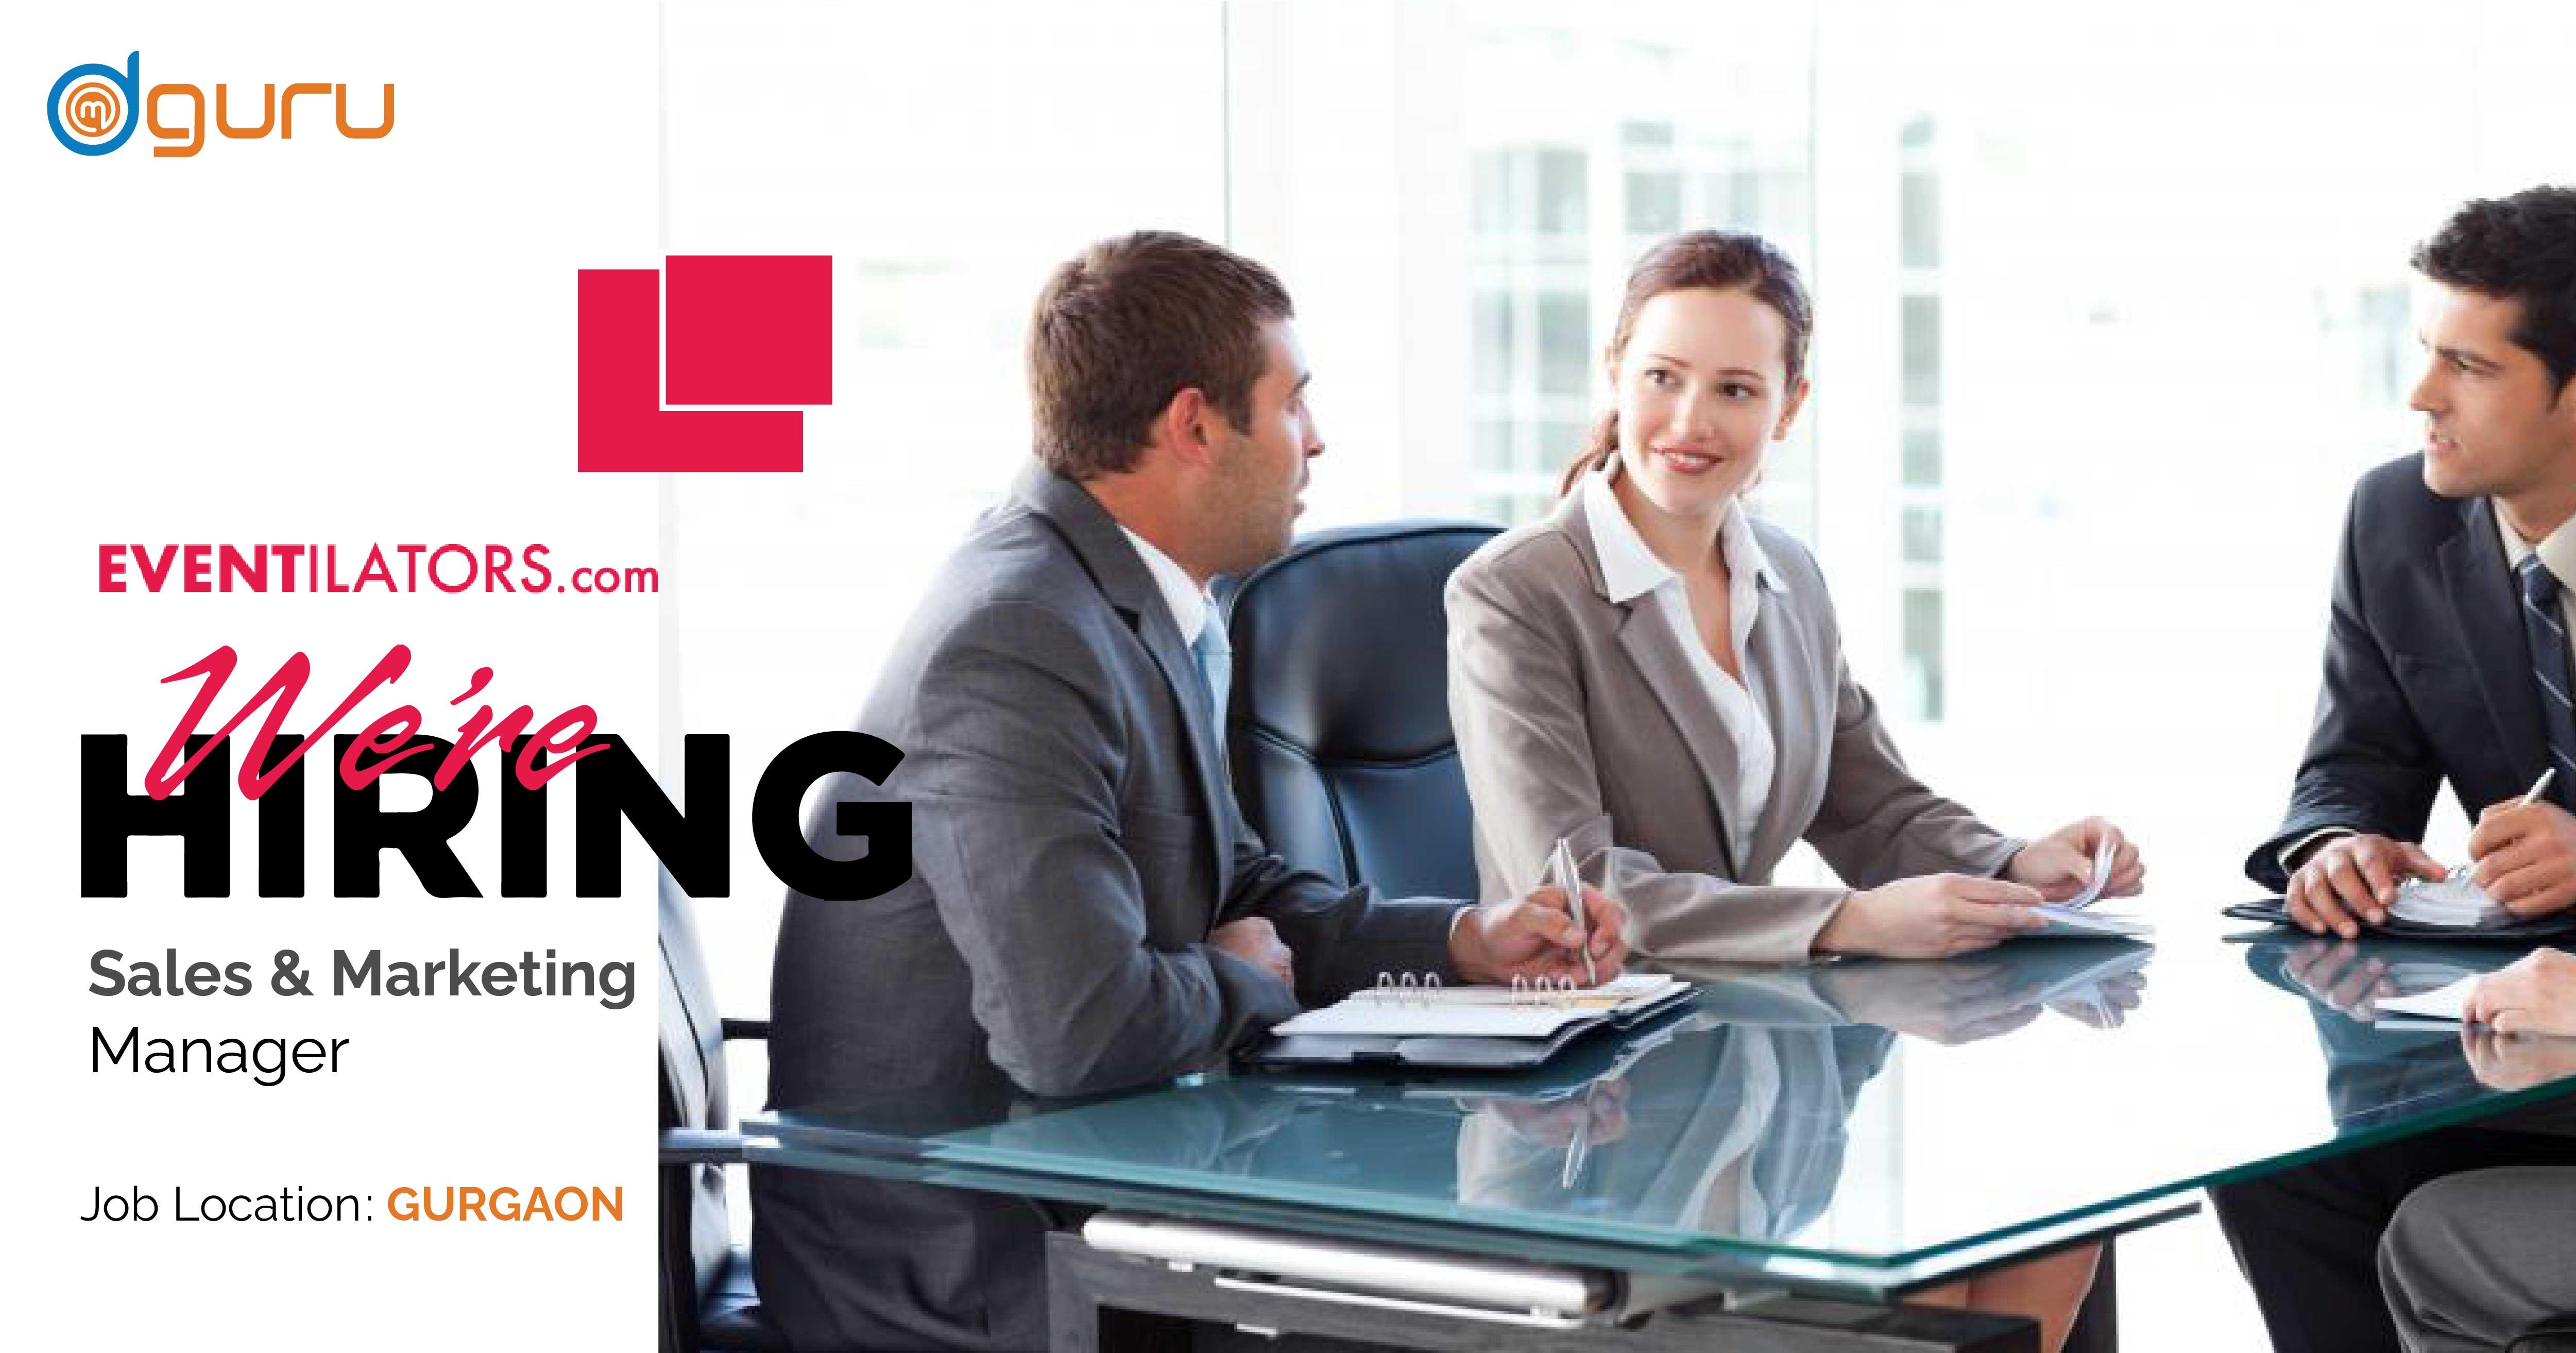 Sales & Marketing Manager at Eventilators